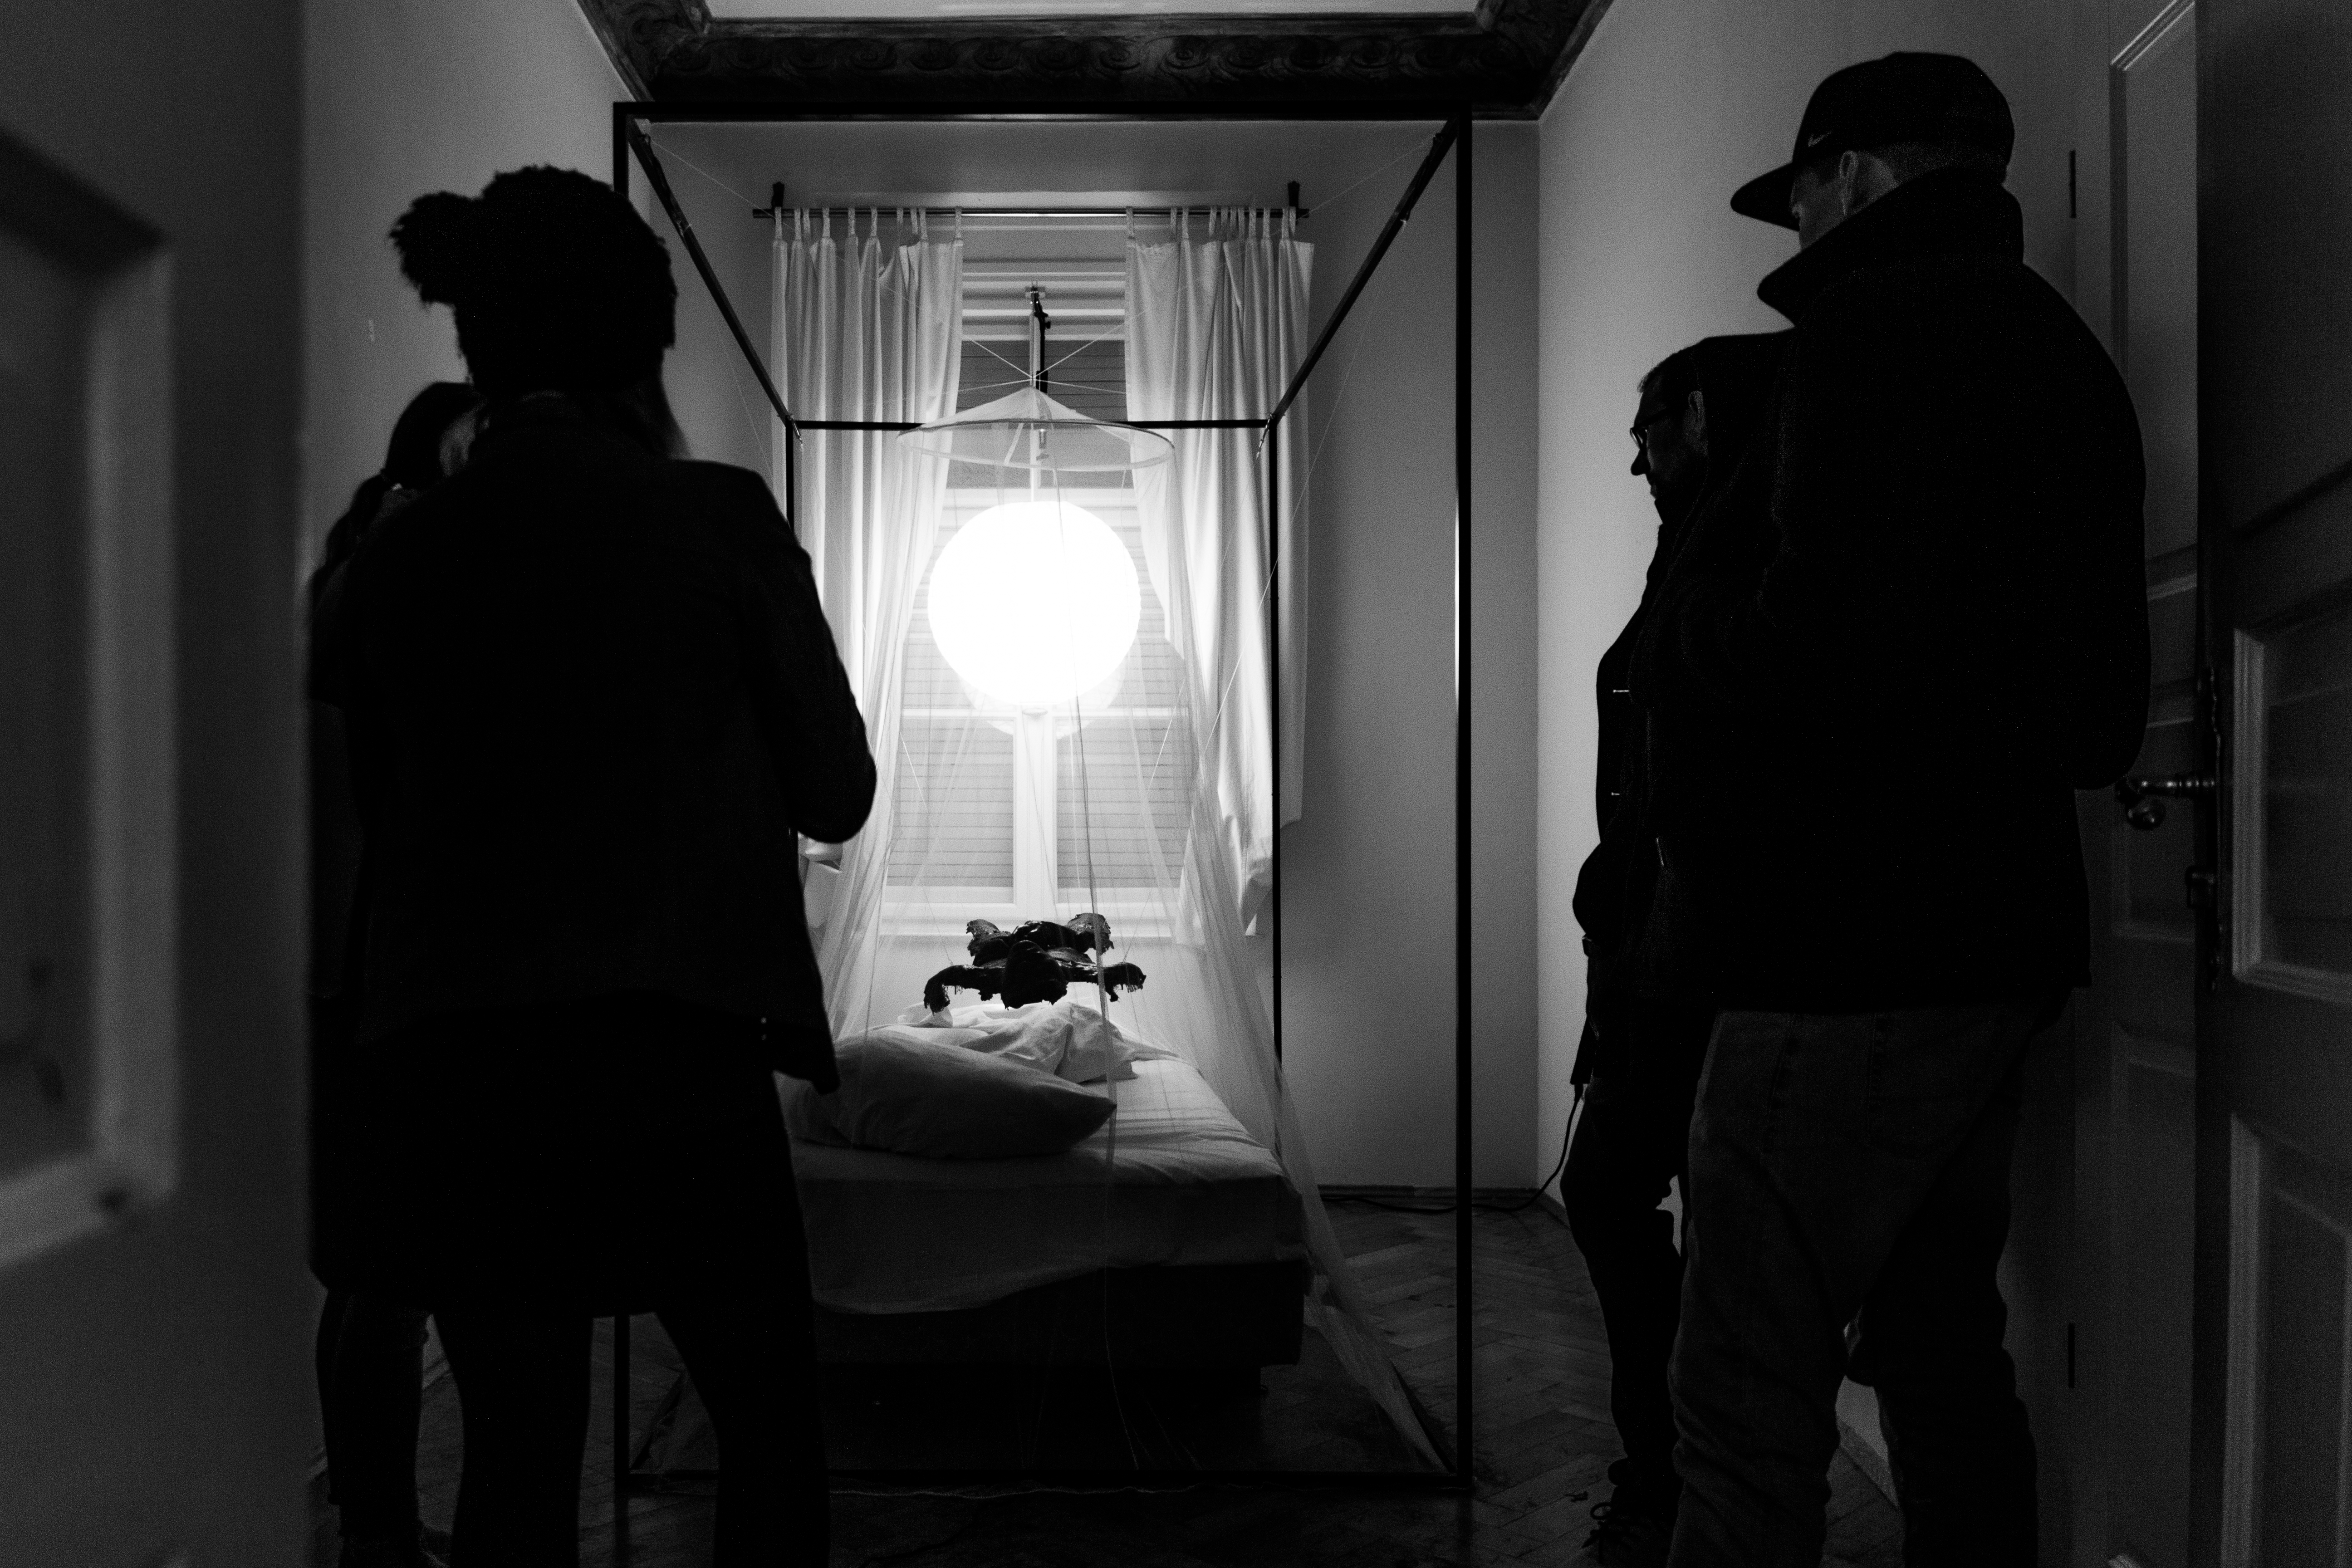 Light Sleeper, 2015